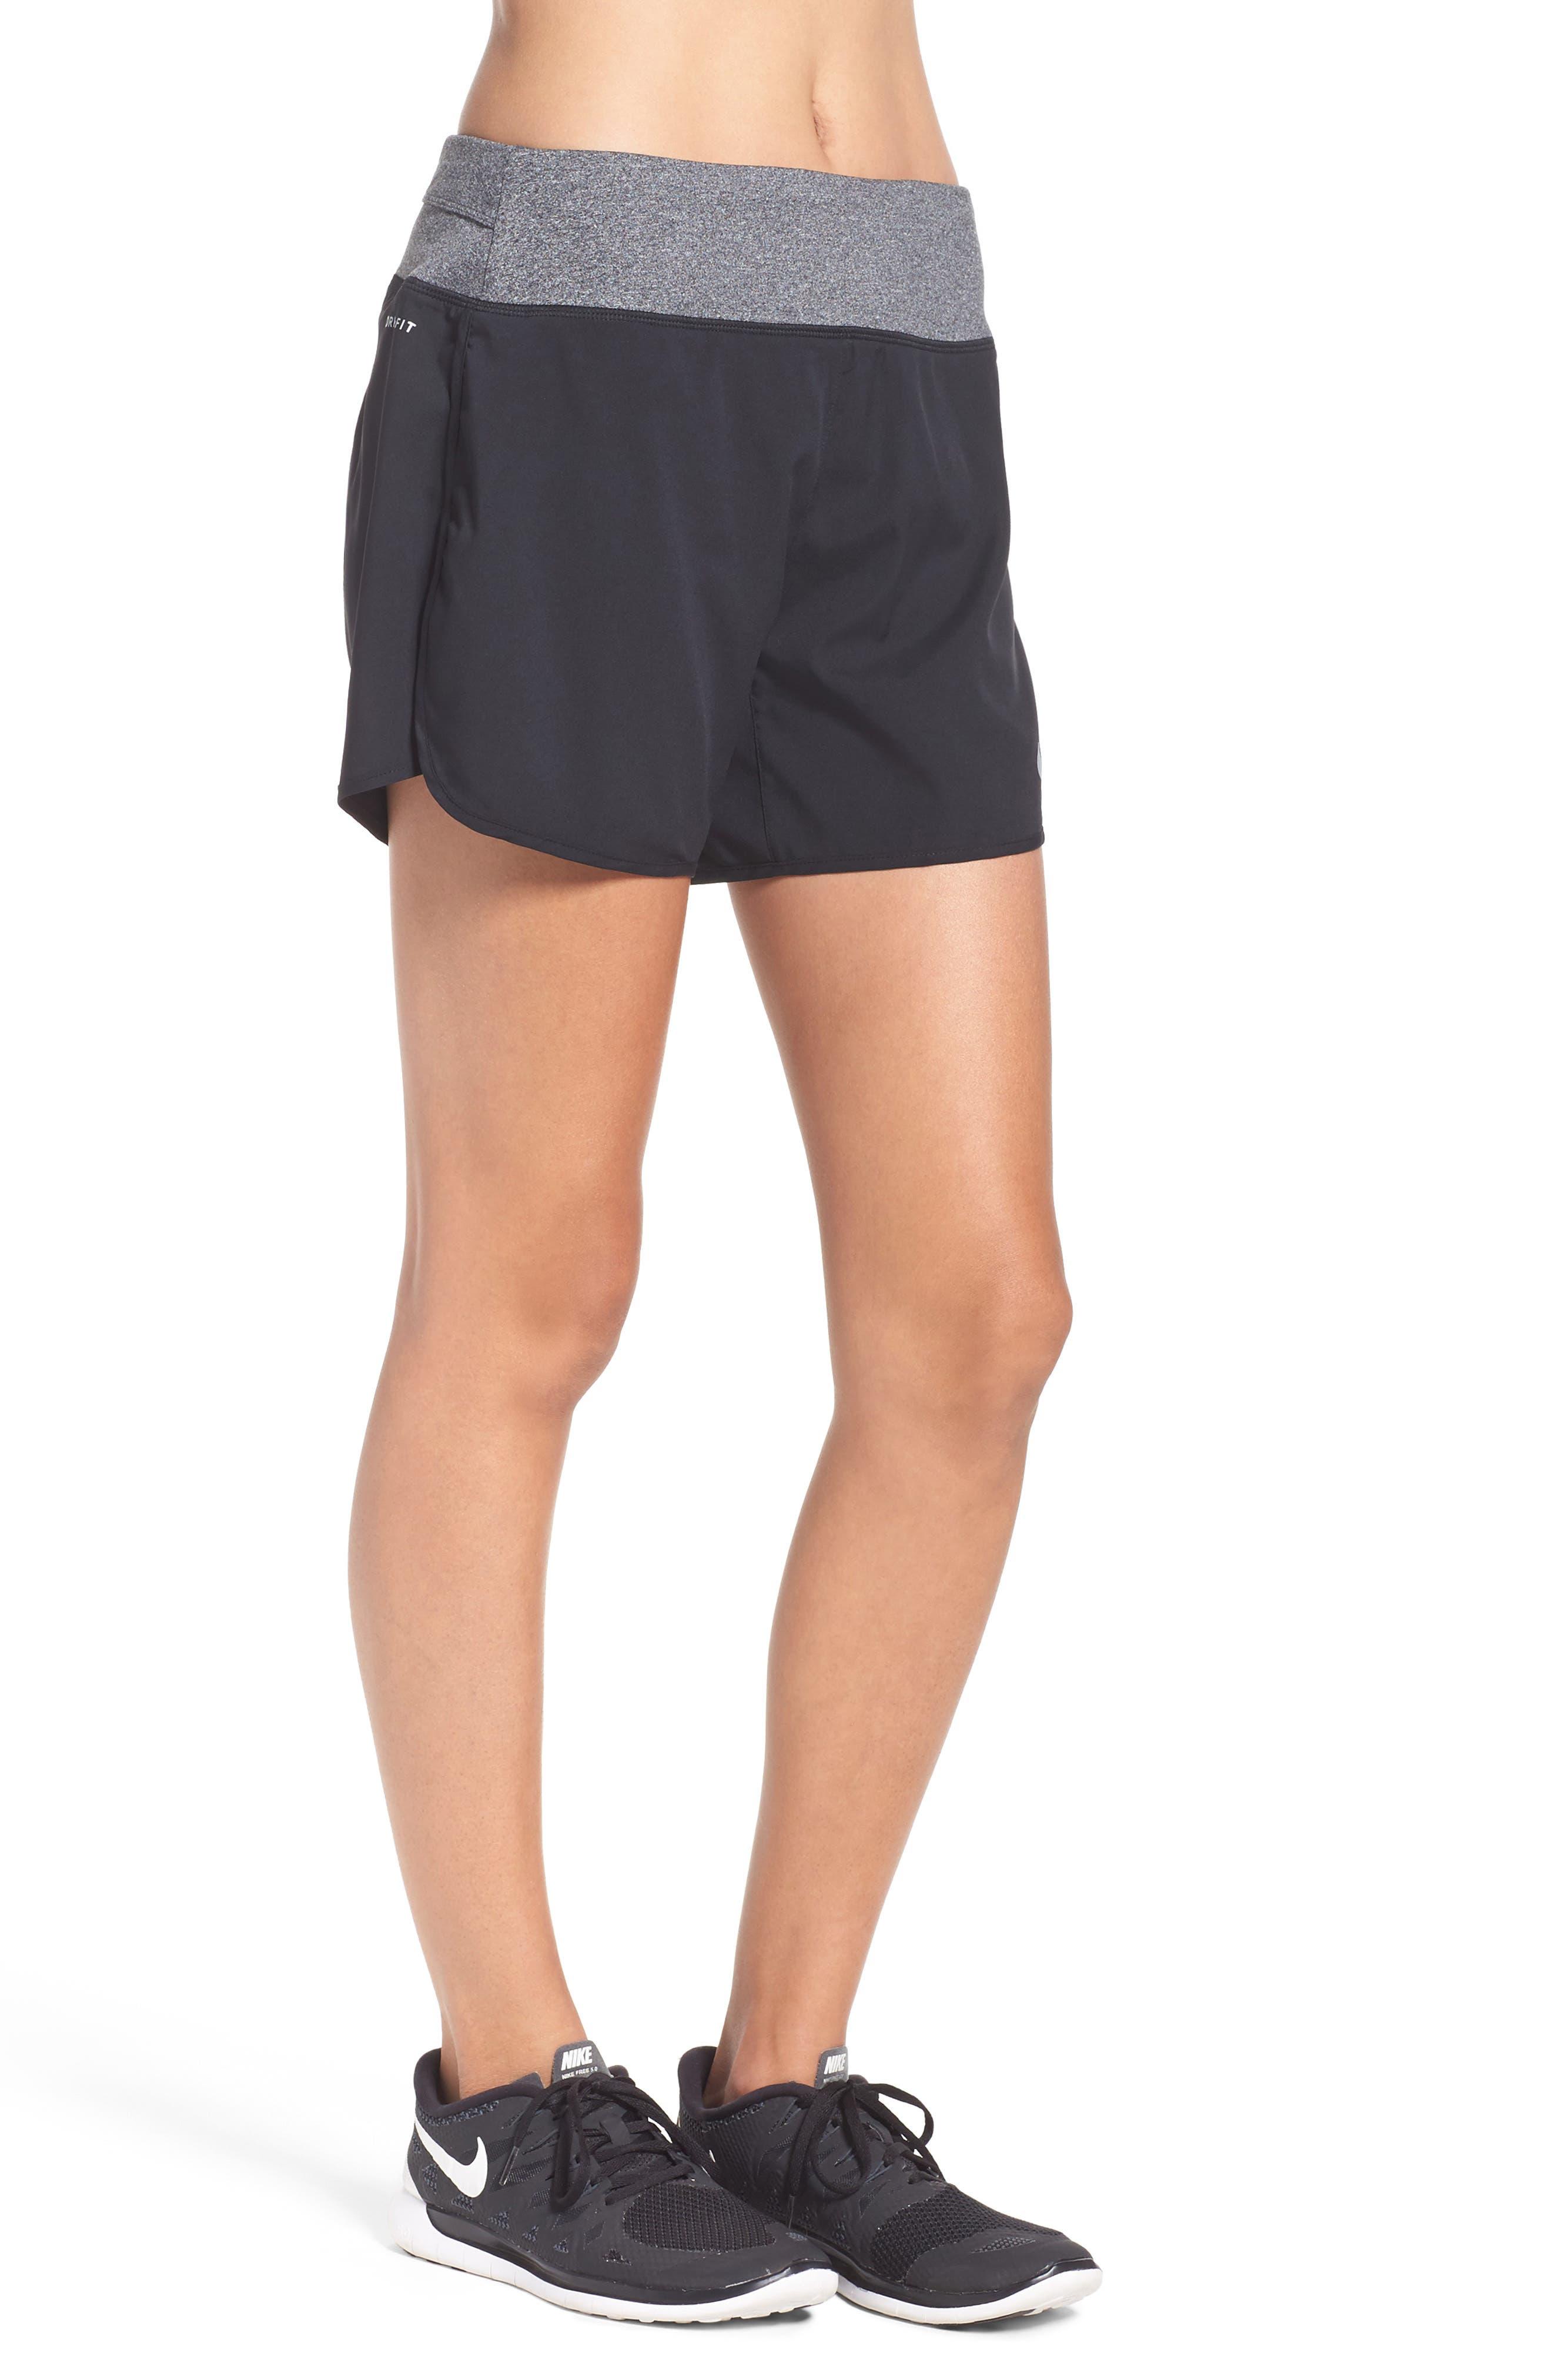 Flex Running Shorts,                             Alternate thumbnail 3, color,                             Black